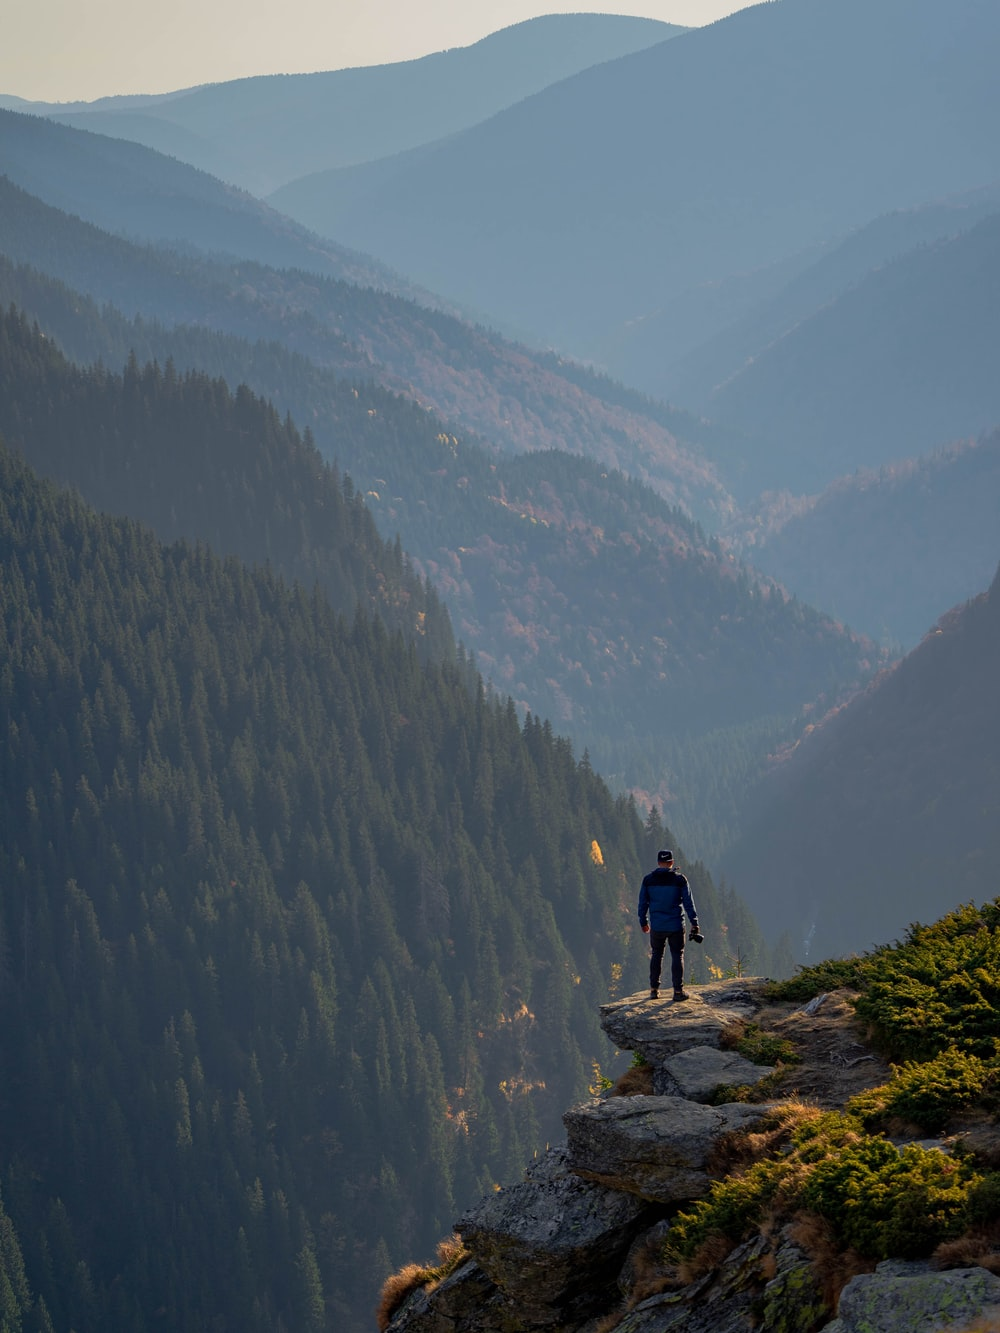 man standing near cliff edge